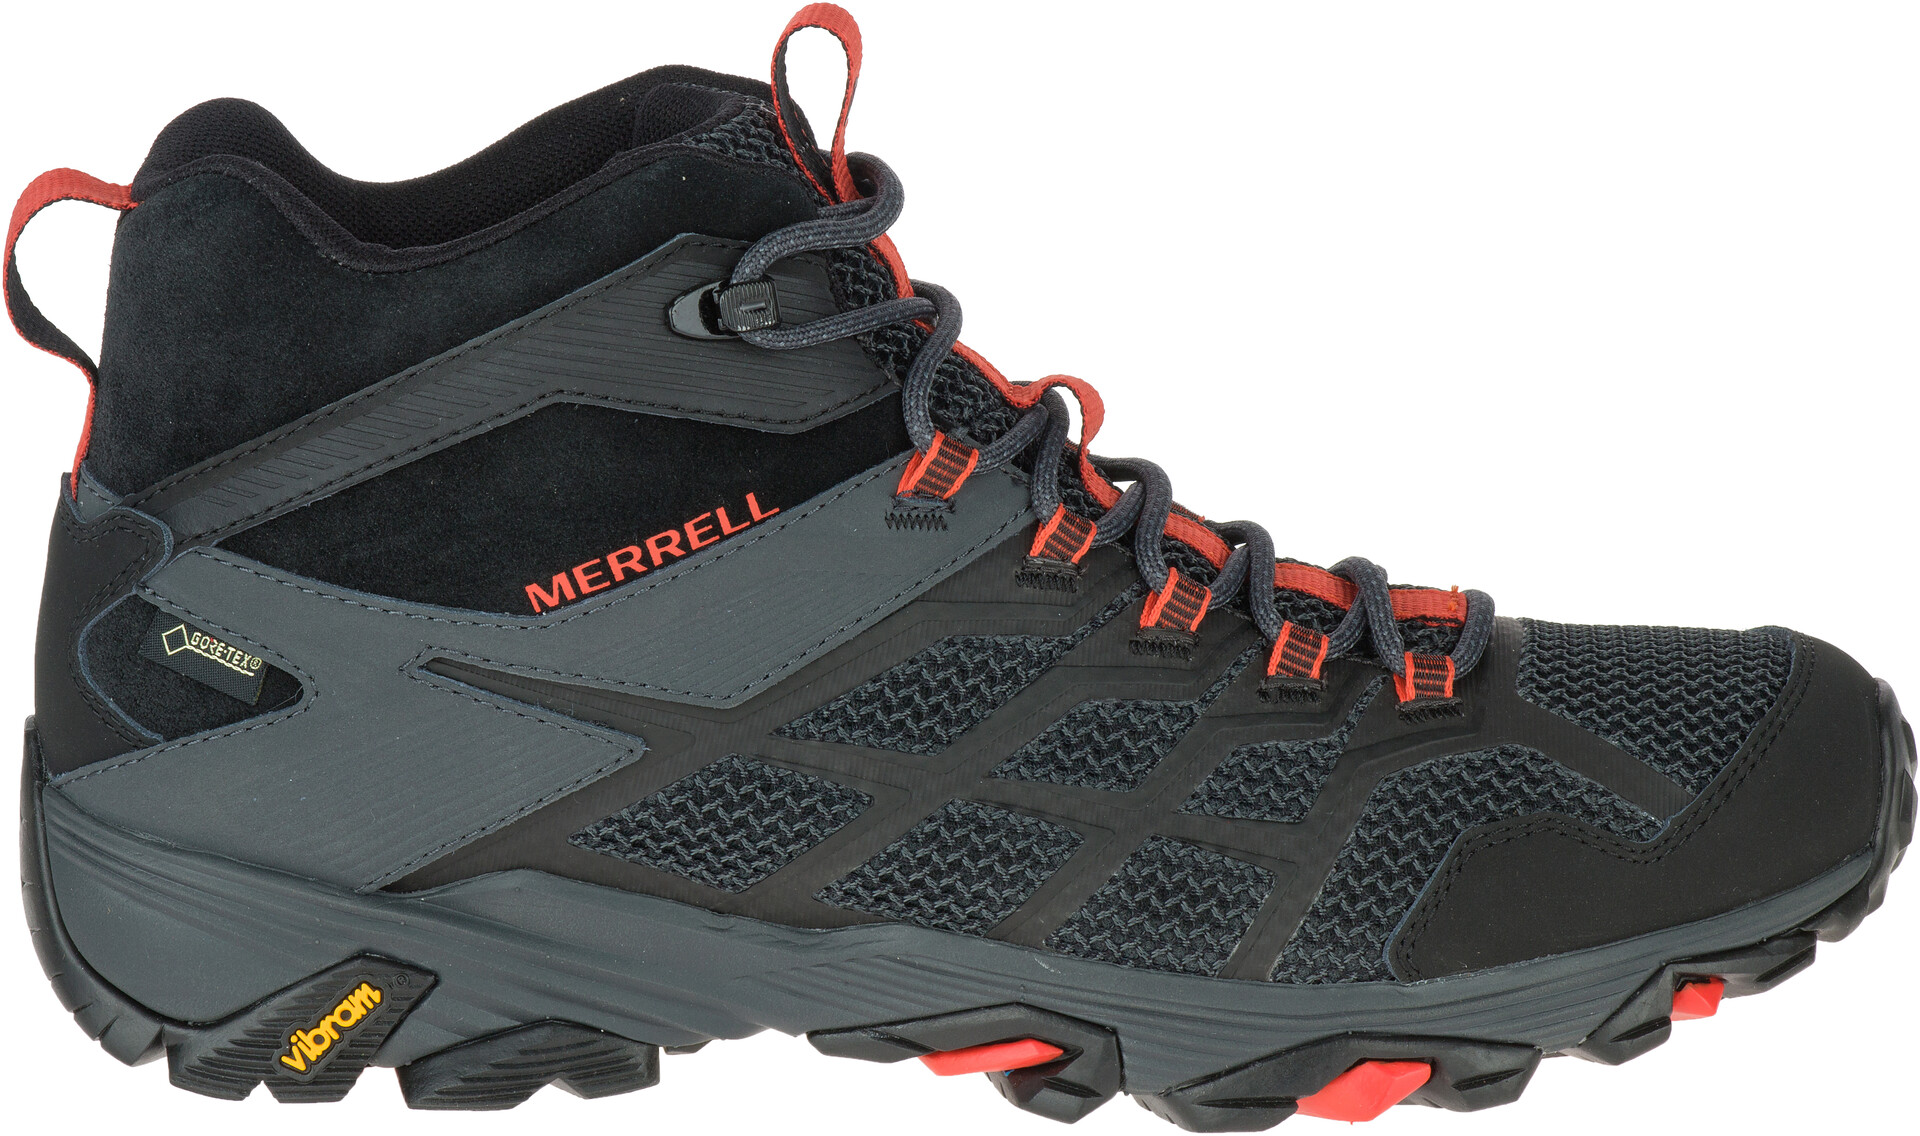 chaussures de randonnée femme magma mid ii